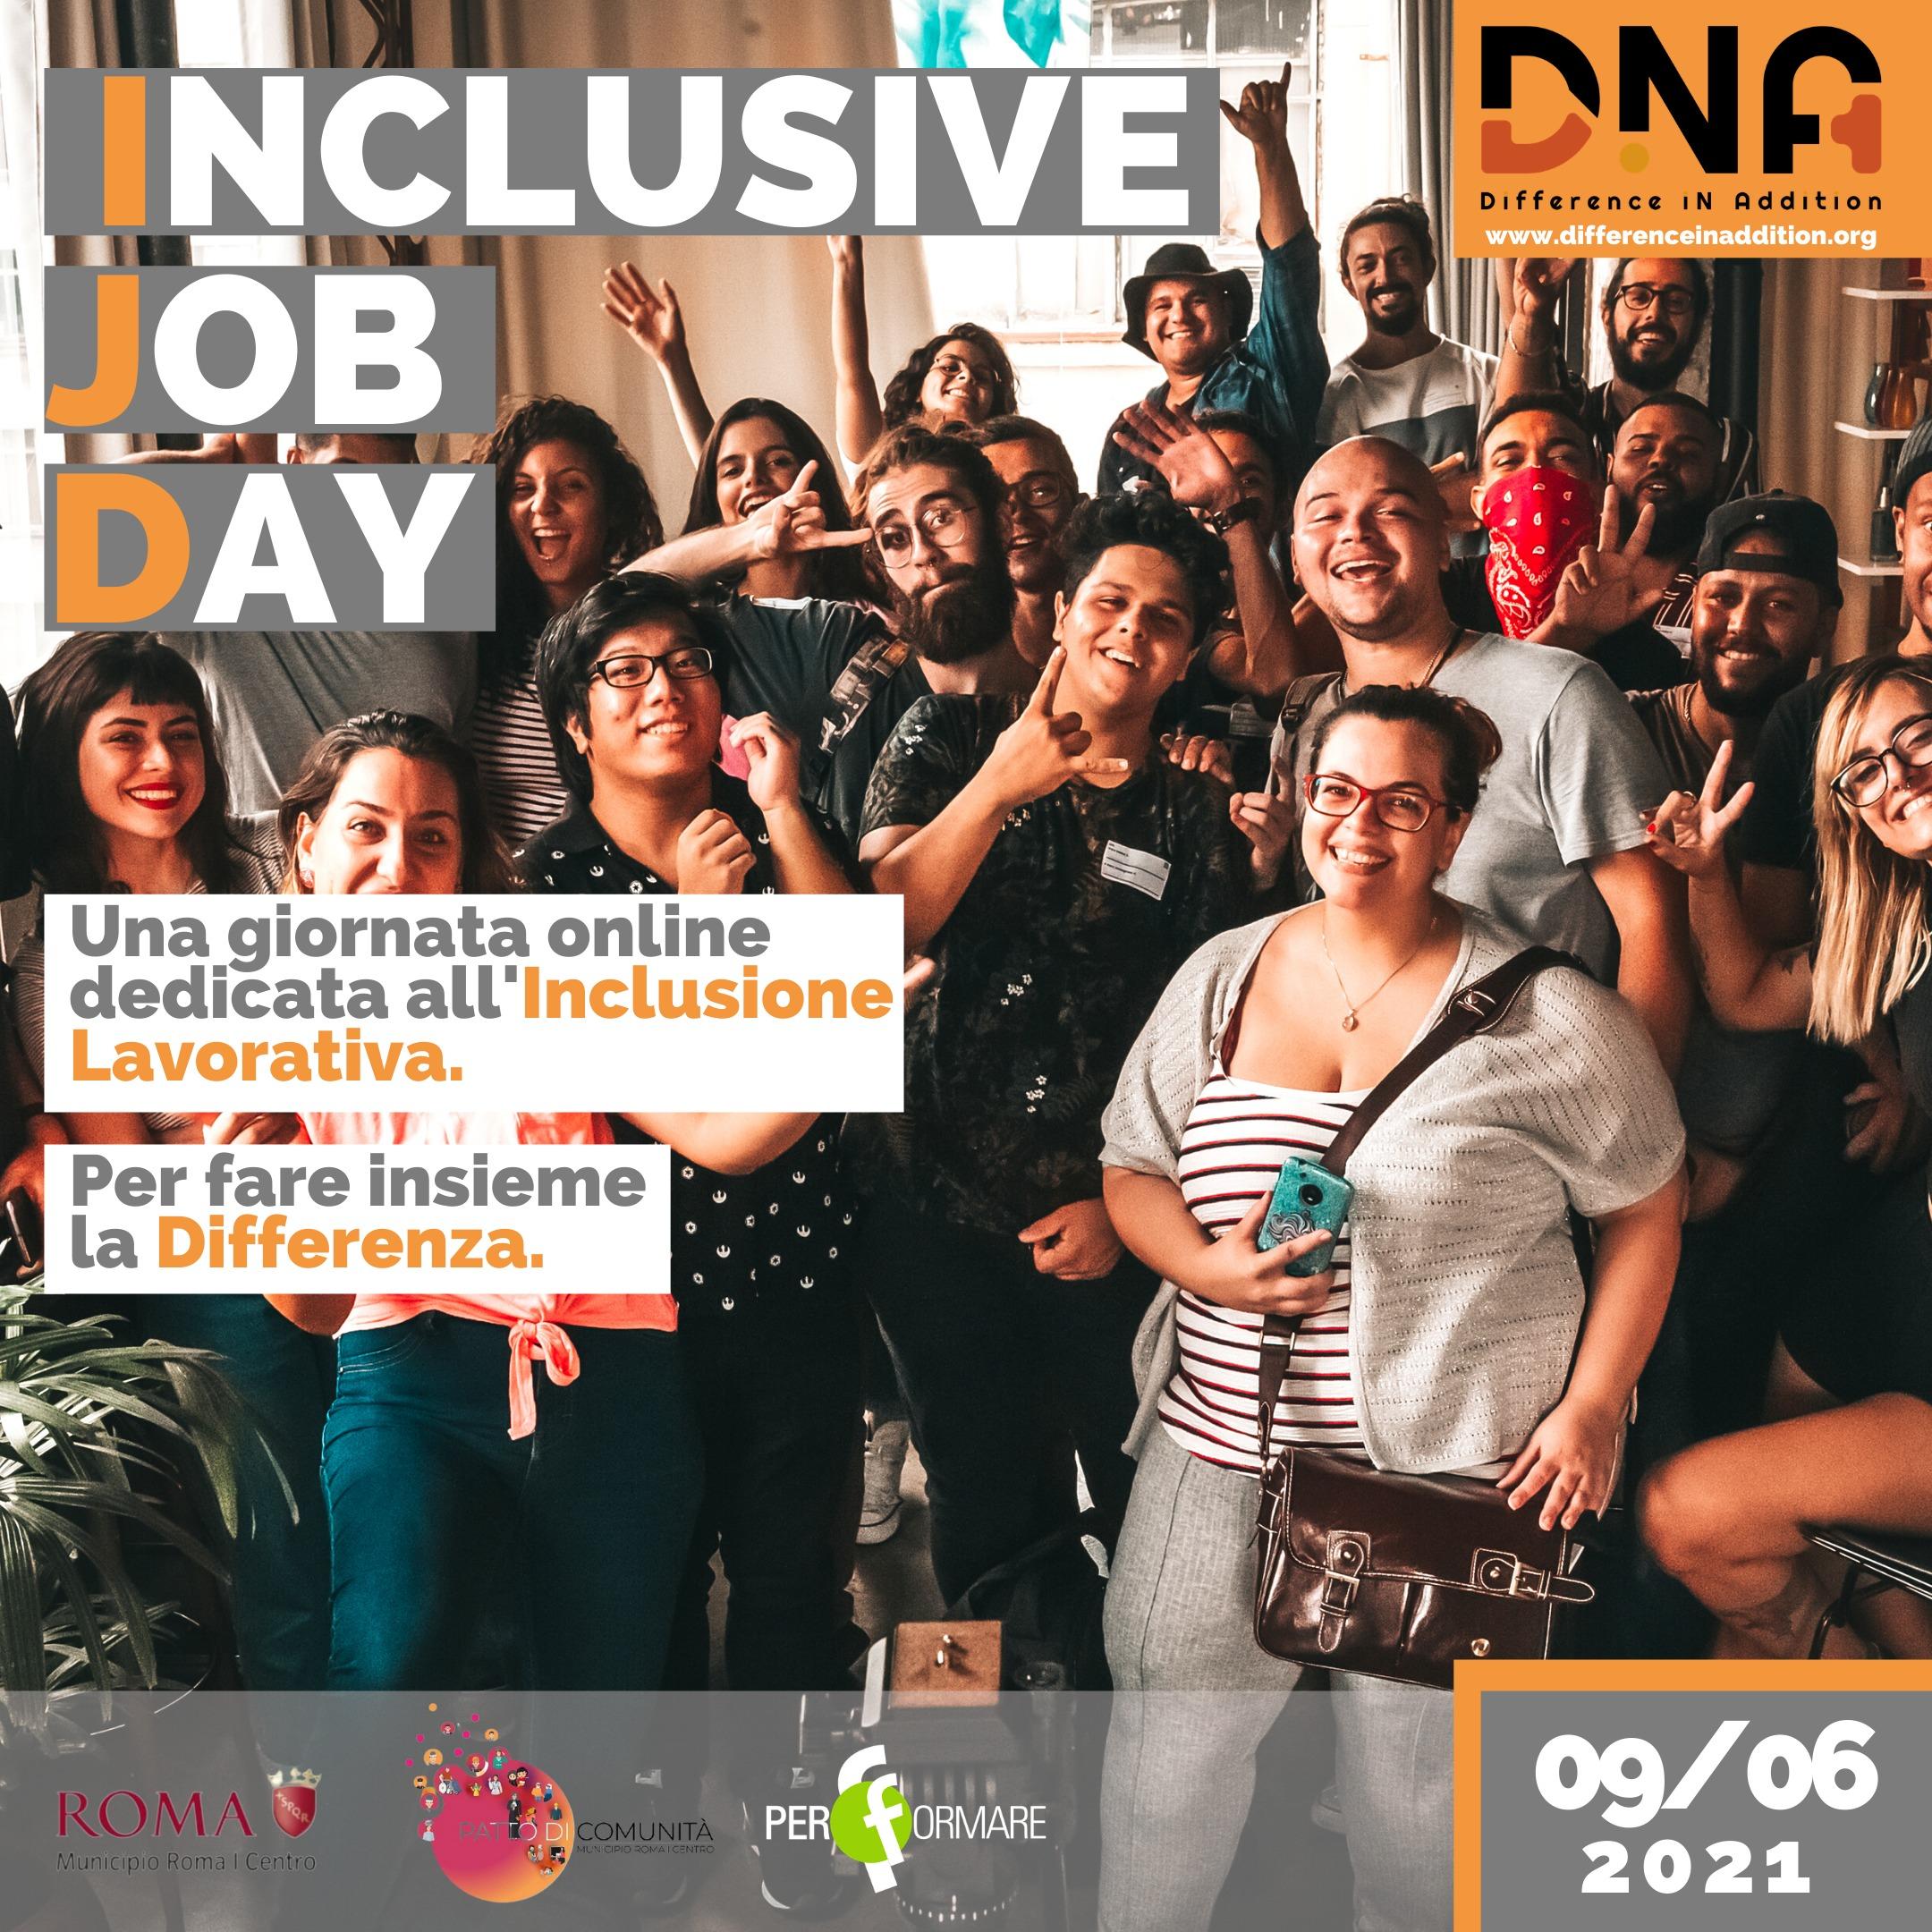 Inclusive Job Day Dna